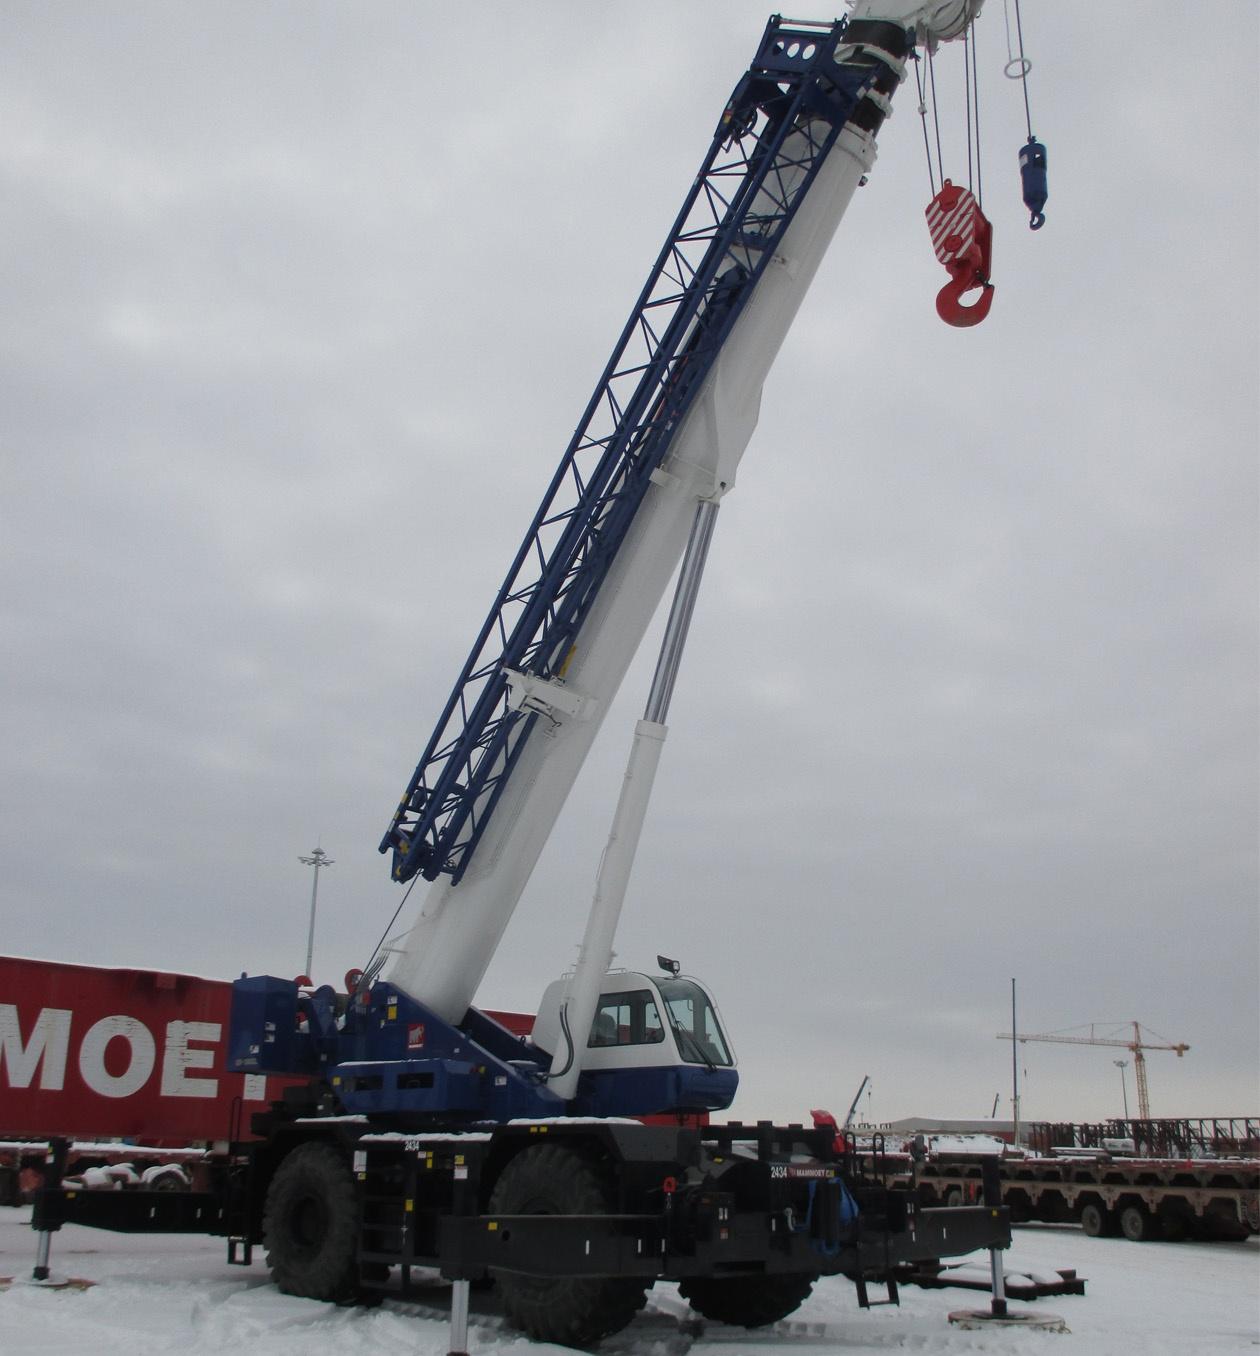 GR-1000XL at Mammoet